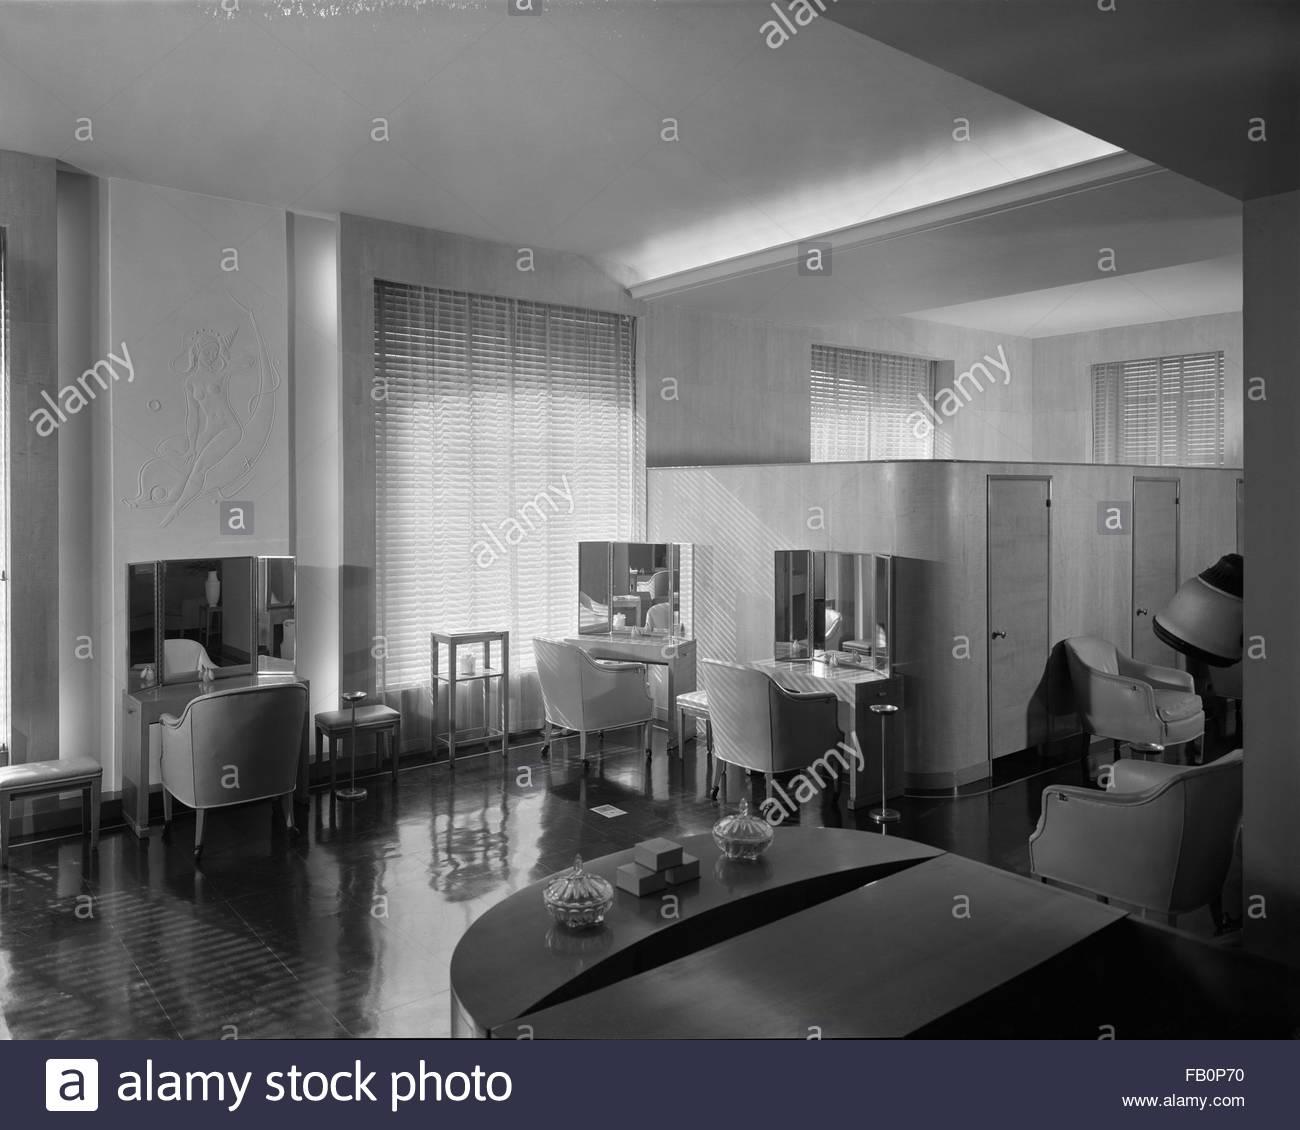 Stevens Hotel in Chicago (Ill.), 1936 Feb. 18. Interior, dressing room. - Stock Image